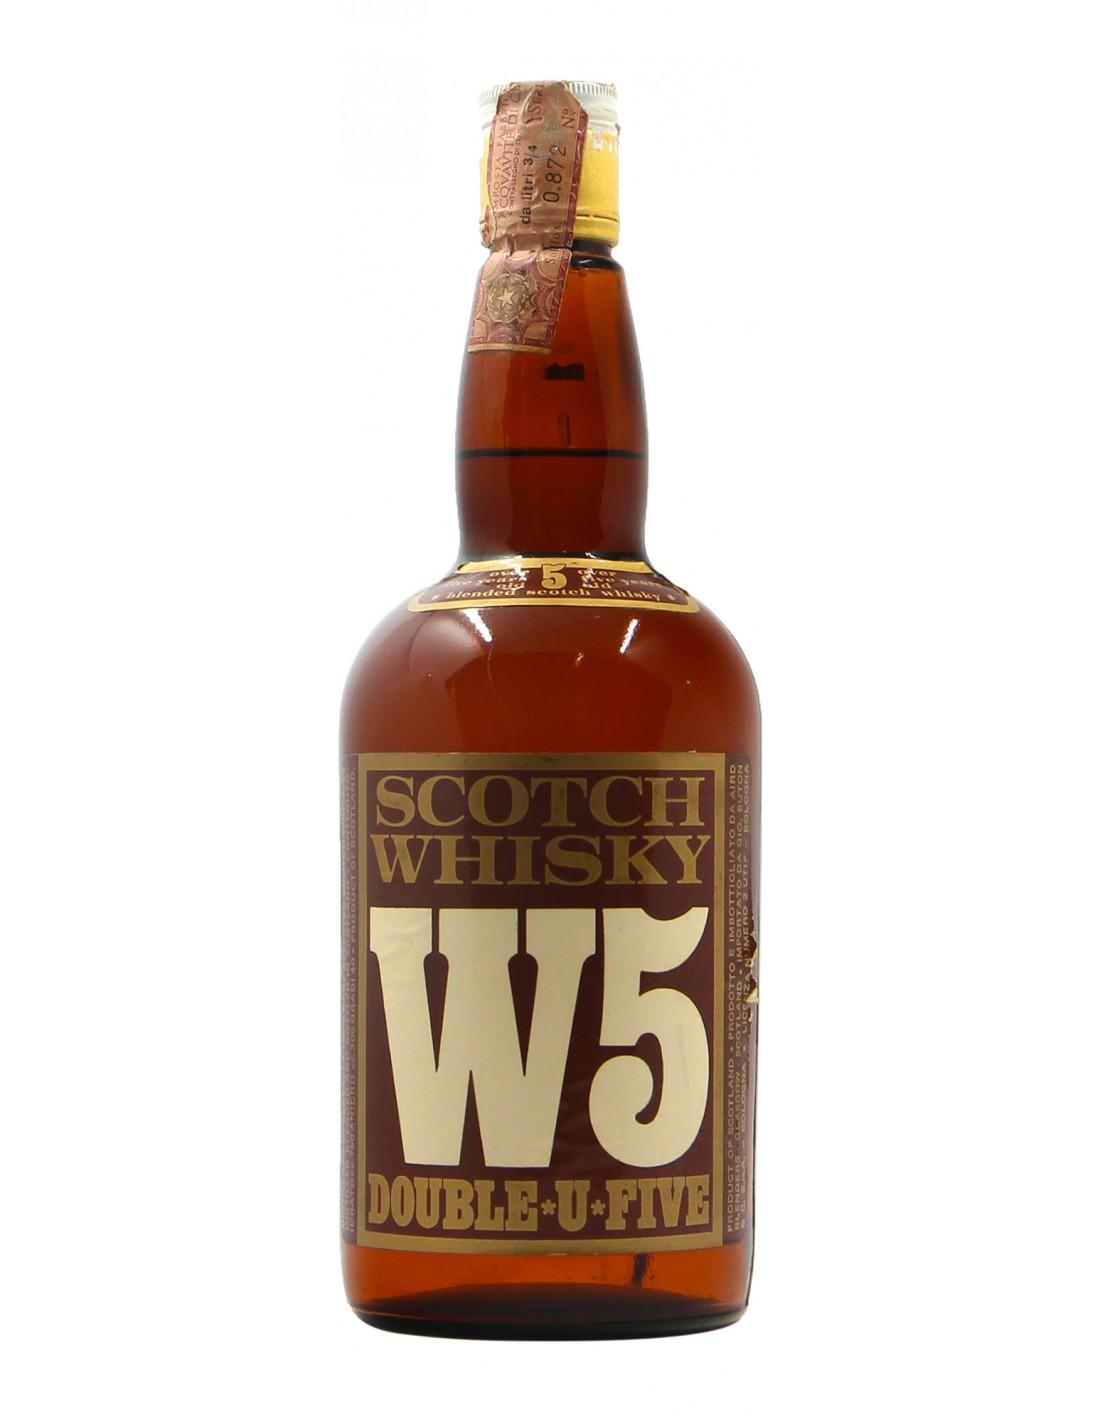 W5 DOUBLE U FIVE SCOTCH WHISKY 75CL 40° NV AIRD BLENDERS Grandi Bottiglie